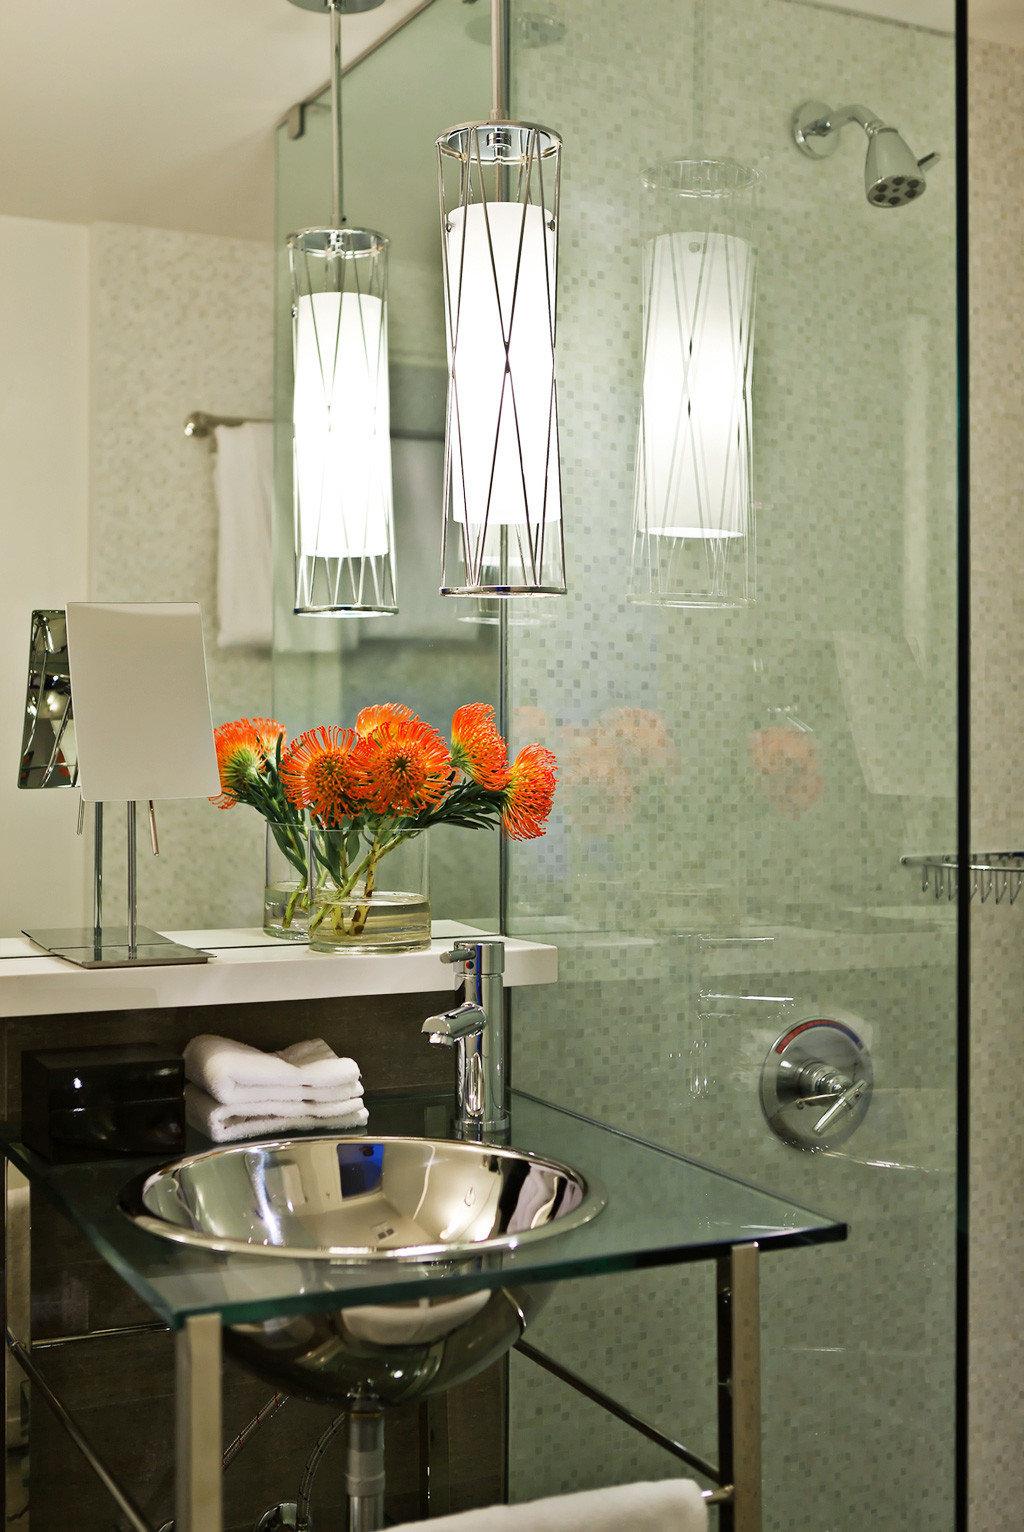 Bath Modern Resort Kitchen lighting home cabinetry countertop sink bathroom